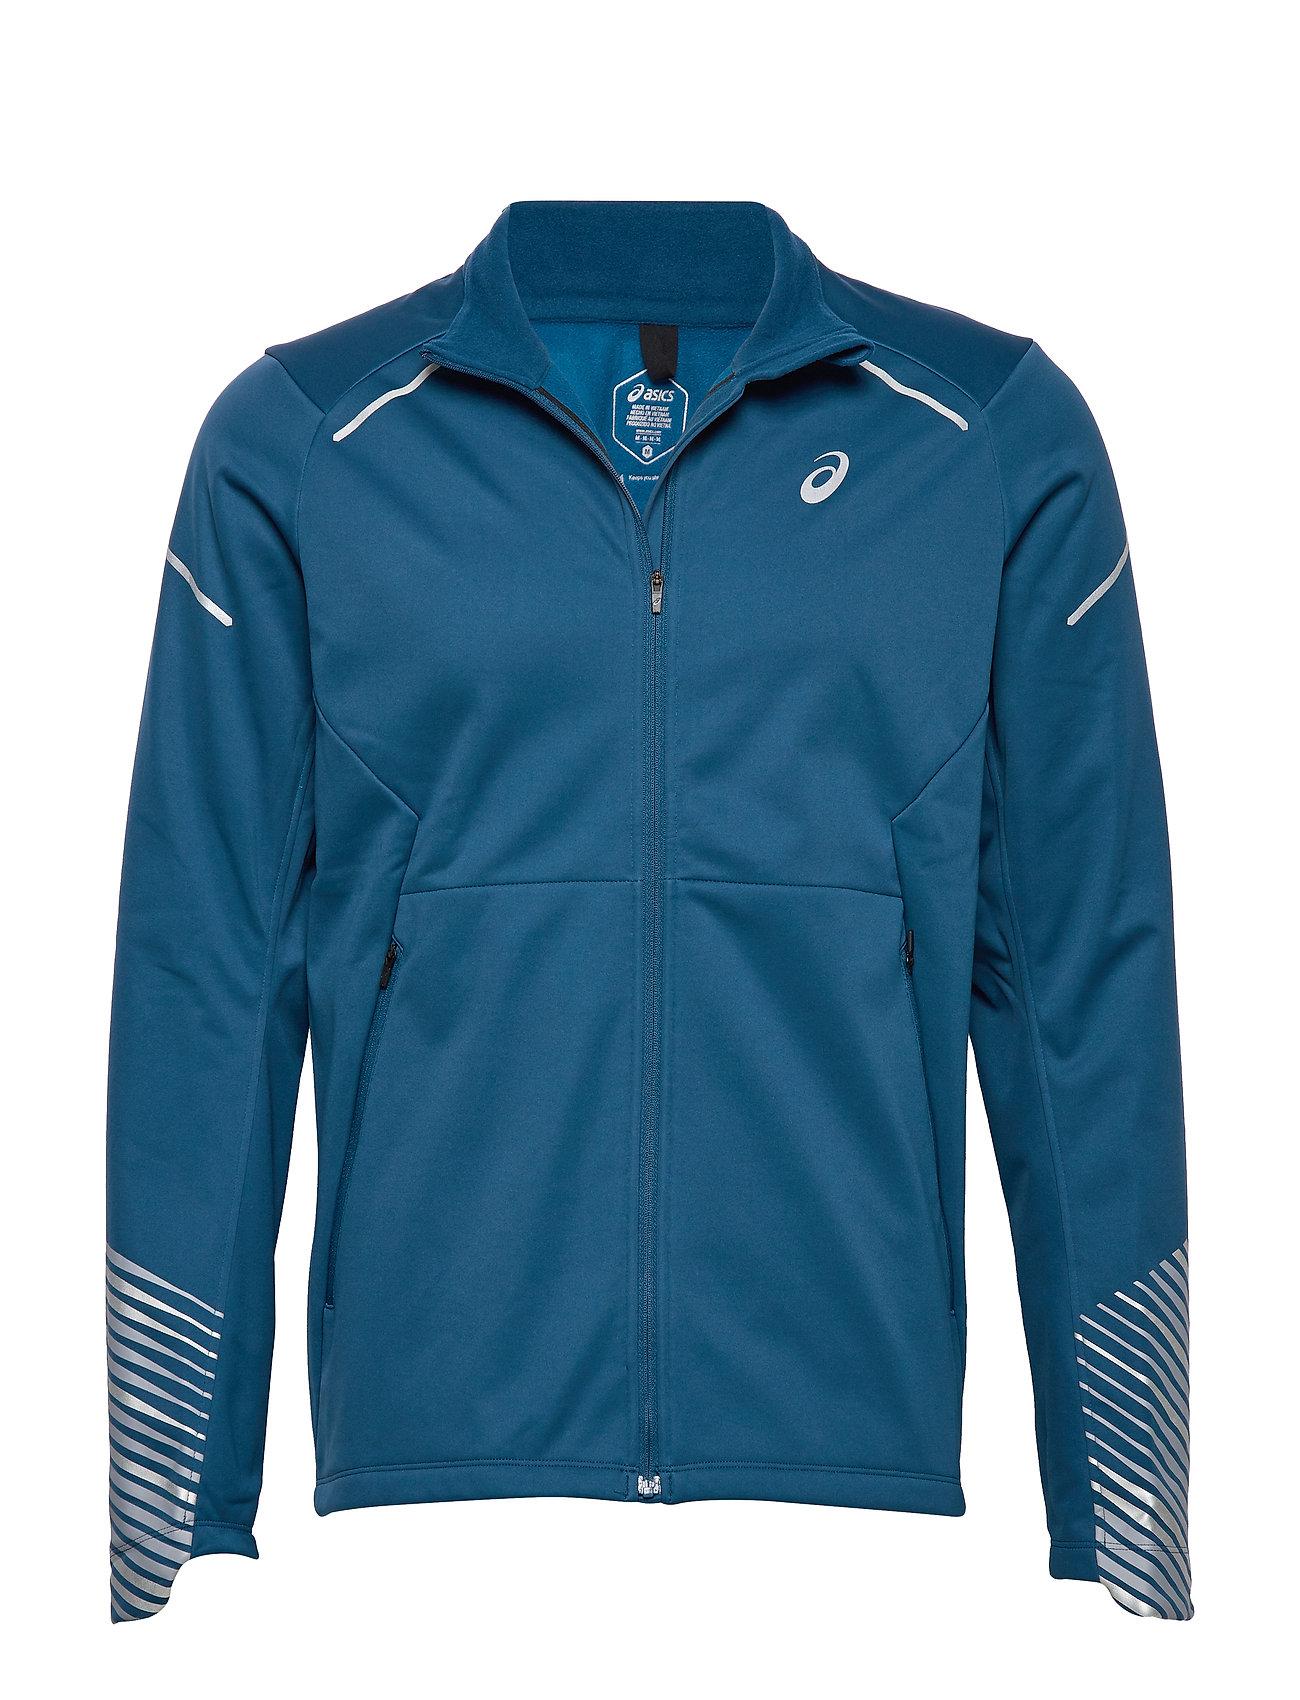 ASICS Lite-Show 2 Winter Jacket Outerwear Sport Jackets Blau ASICS